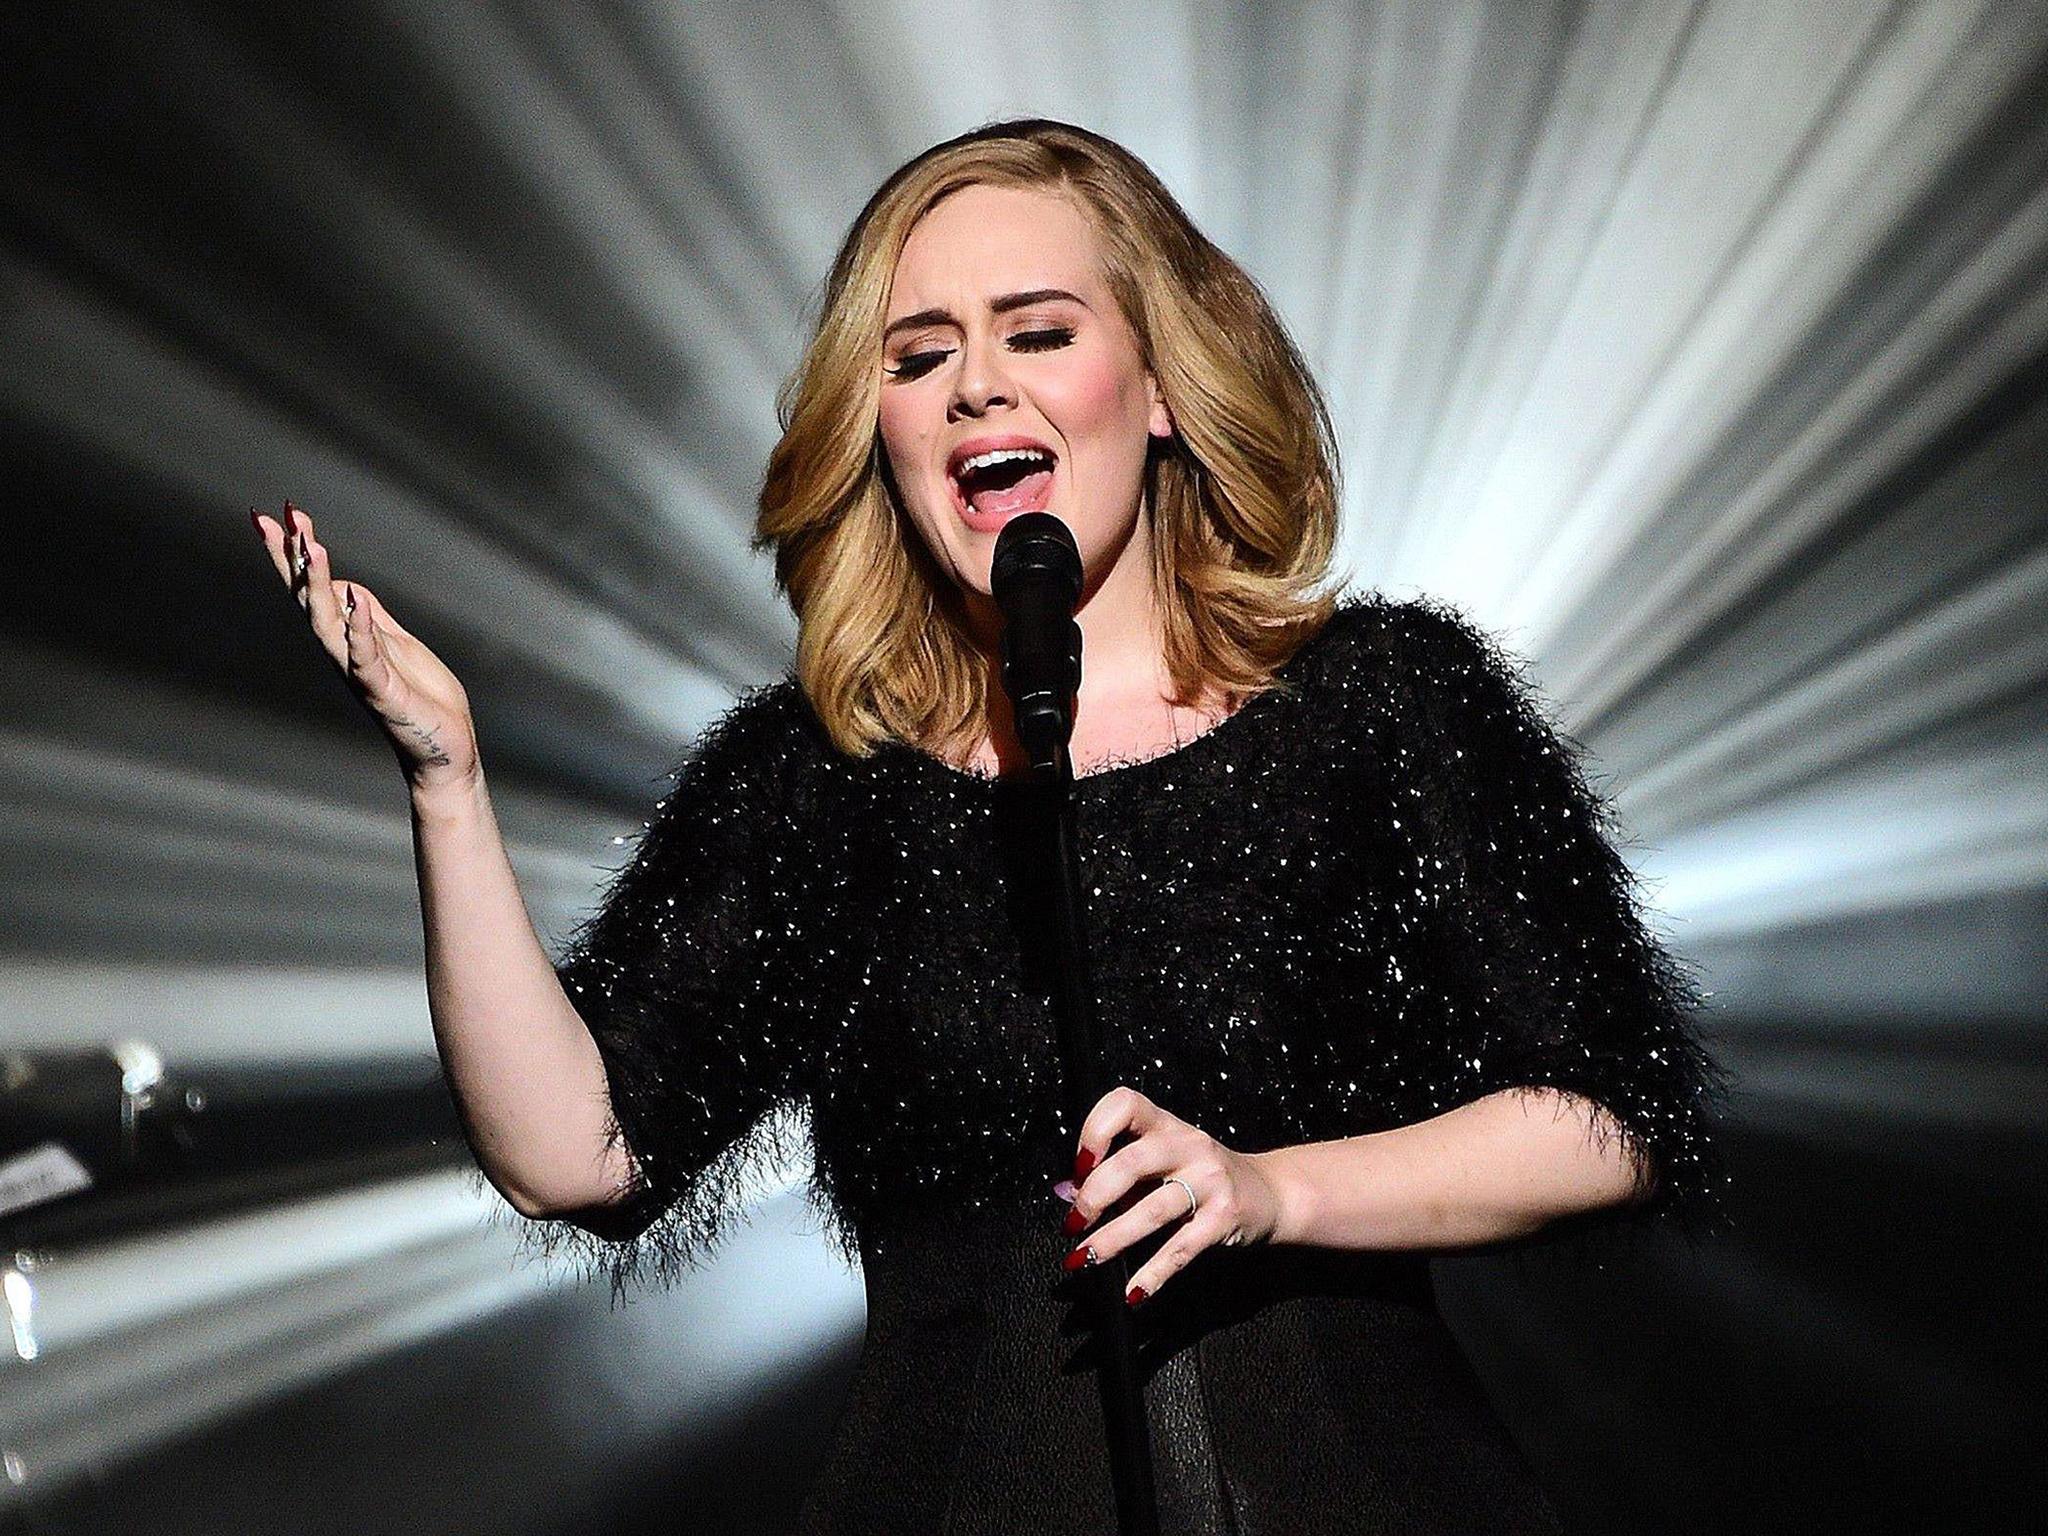 Mandatory Credit: Photo by GHNASSIA/NMA2016/SIPA/REX (5355608er) Adele NRJ Music Awards, Show, Cannes, France - 07 Nov 2015